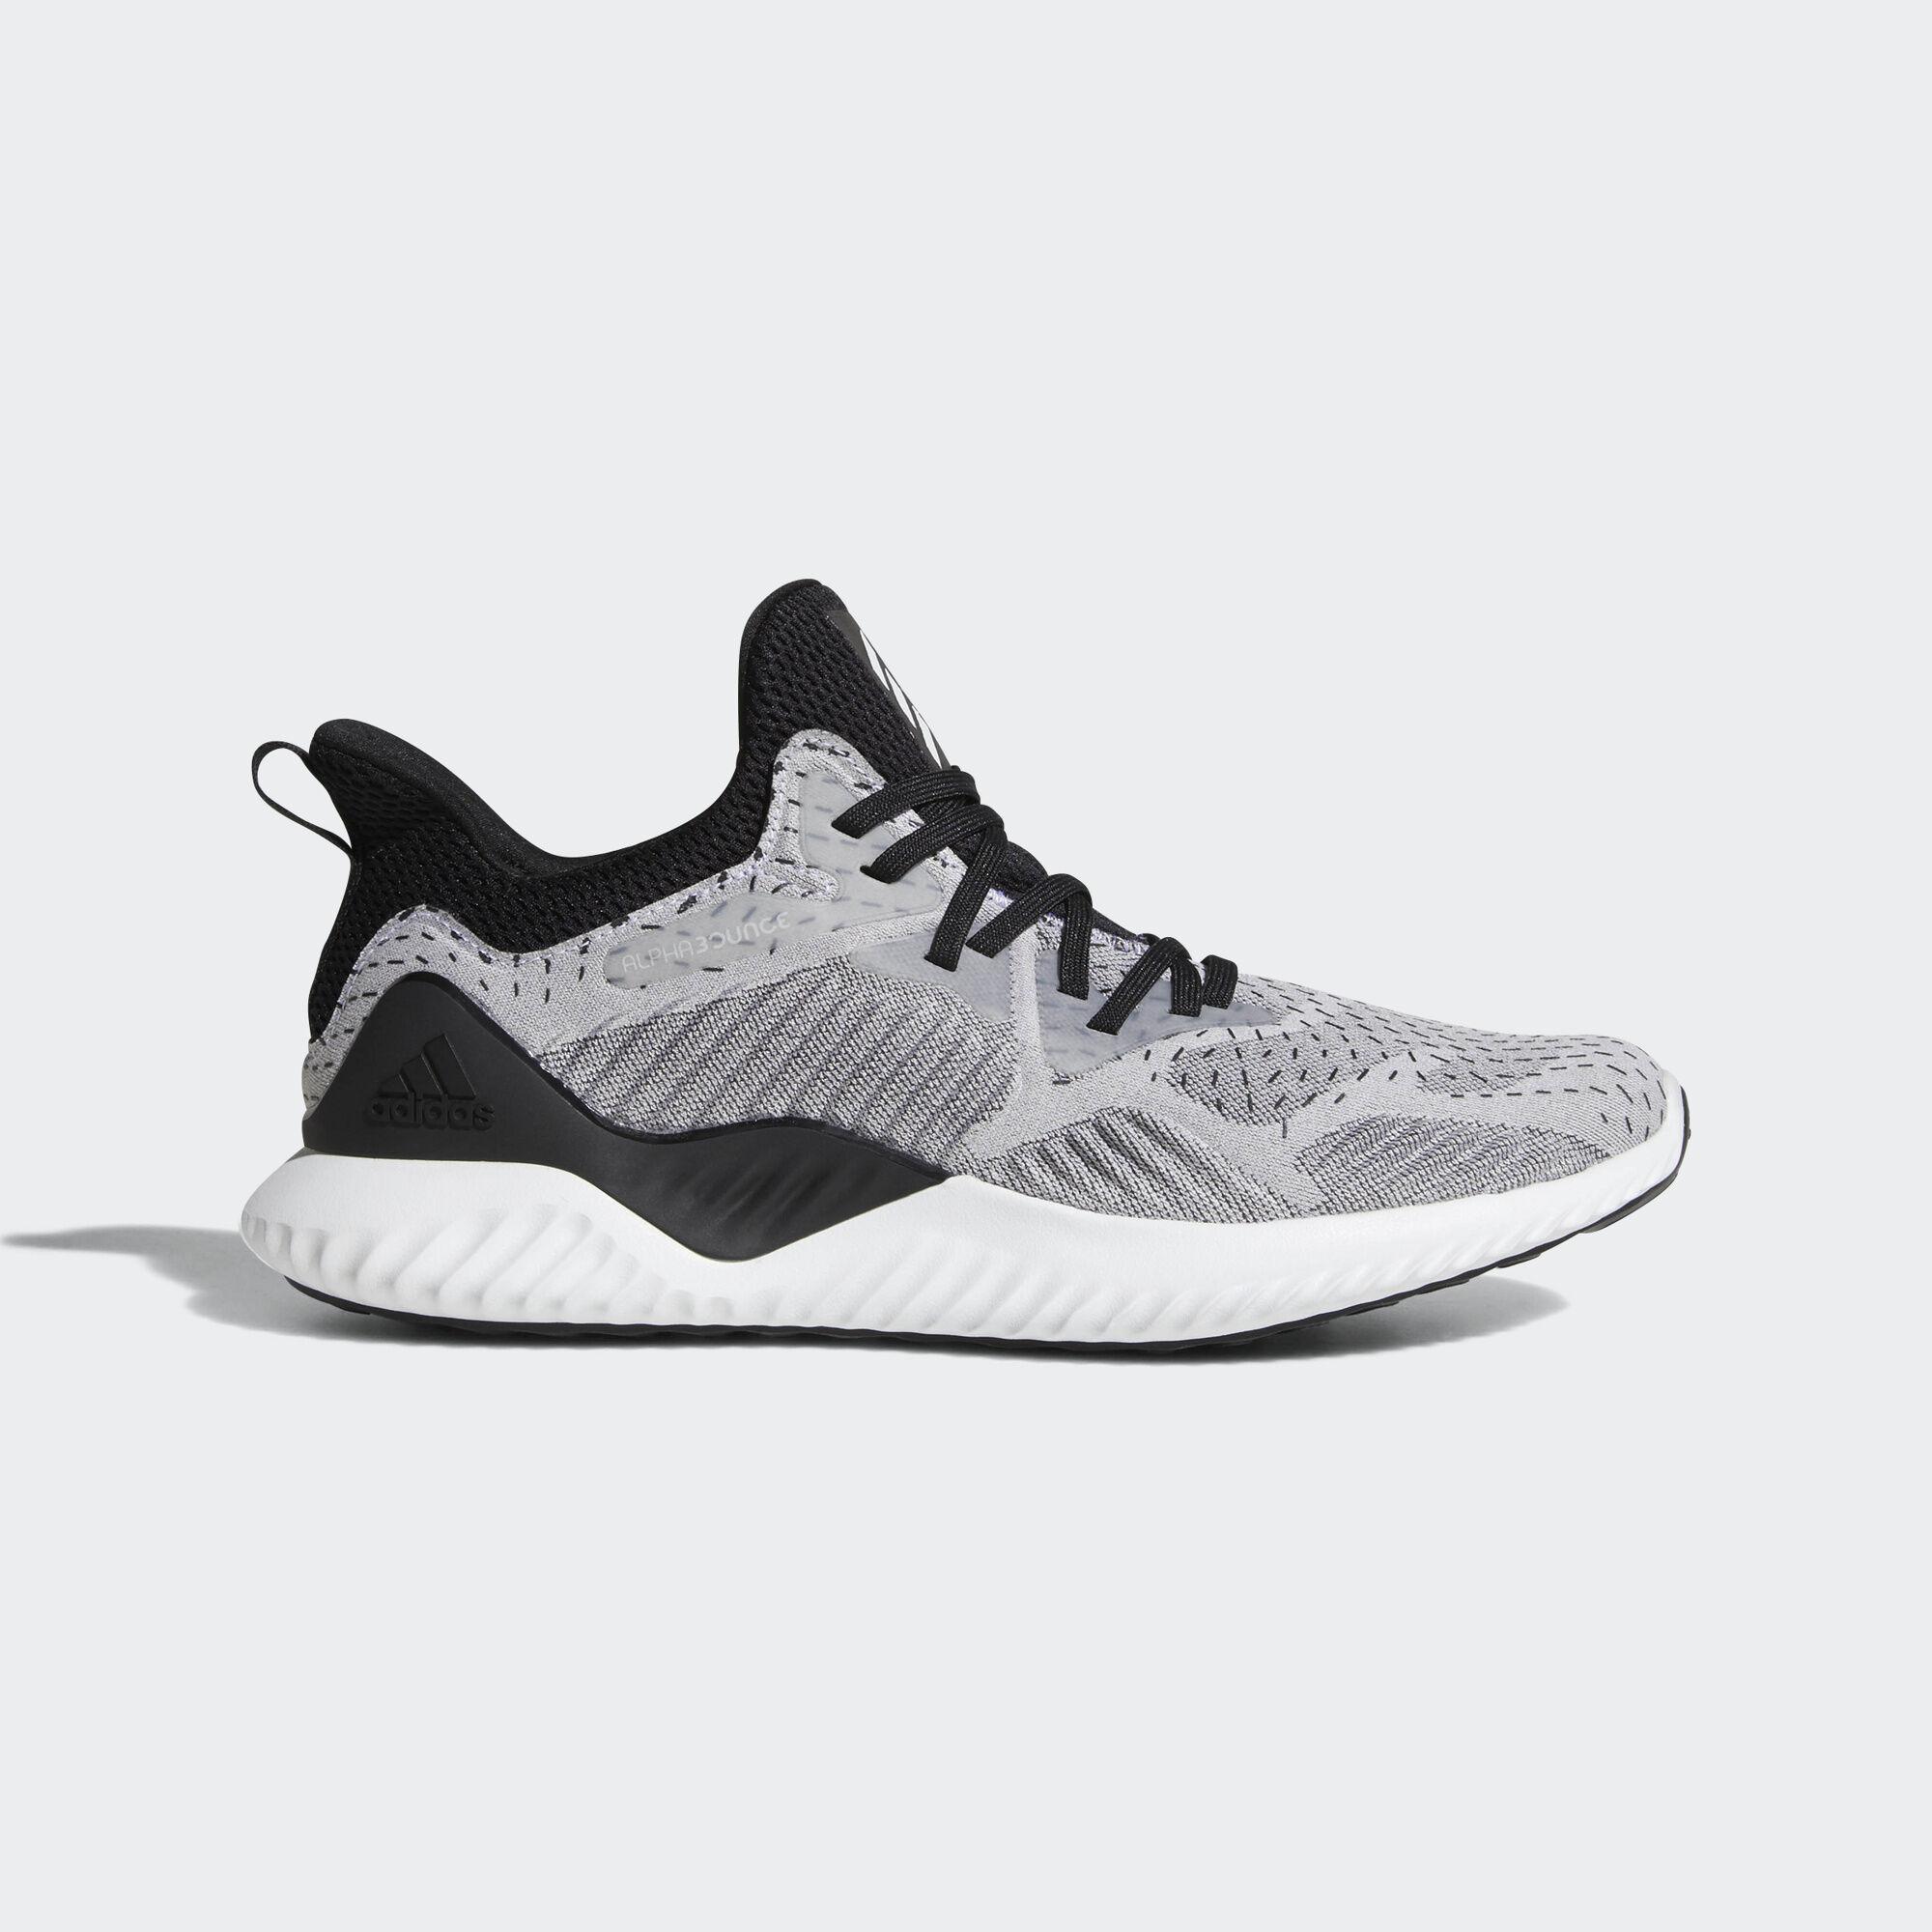 adidas Alphabounce Beyond Shoe 6EmXsdZP5W